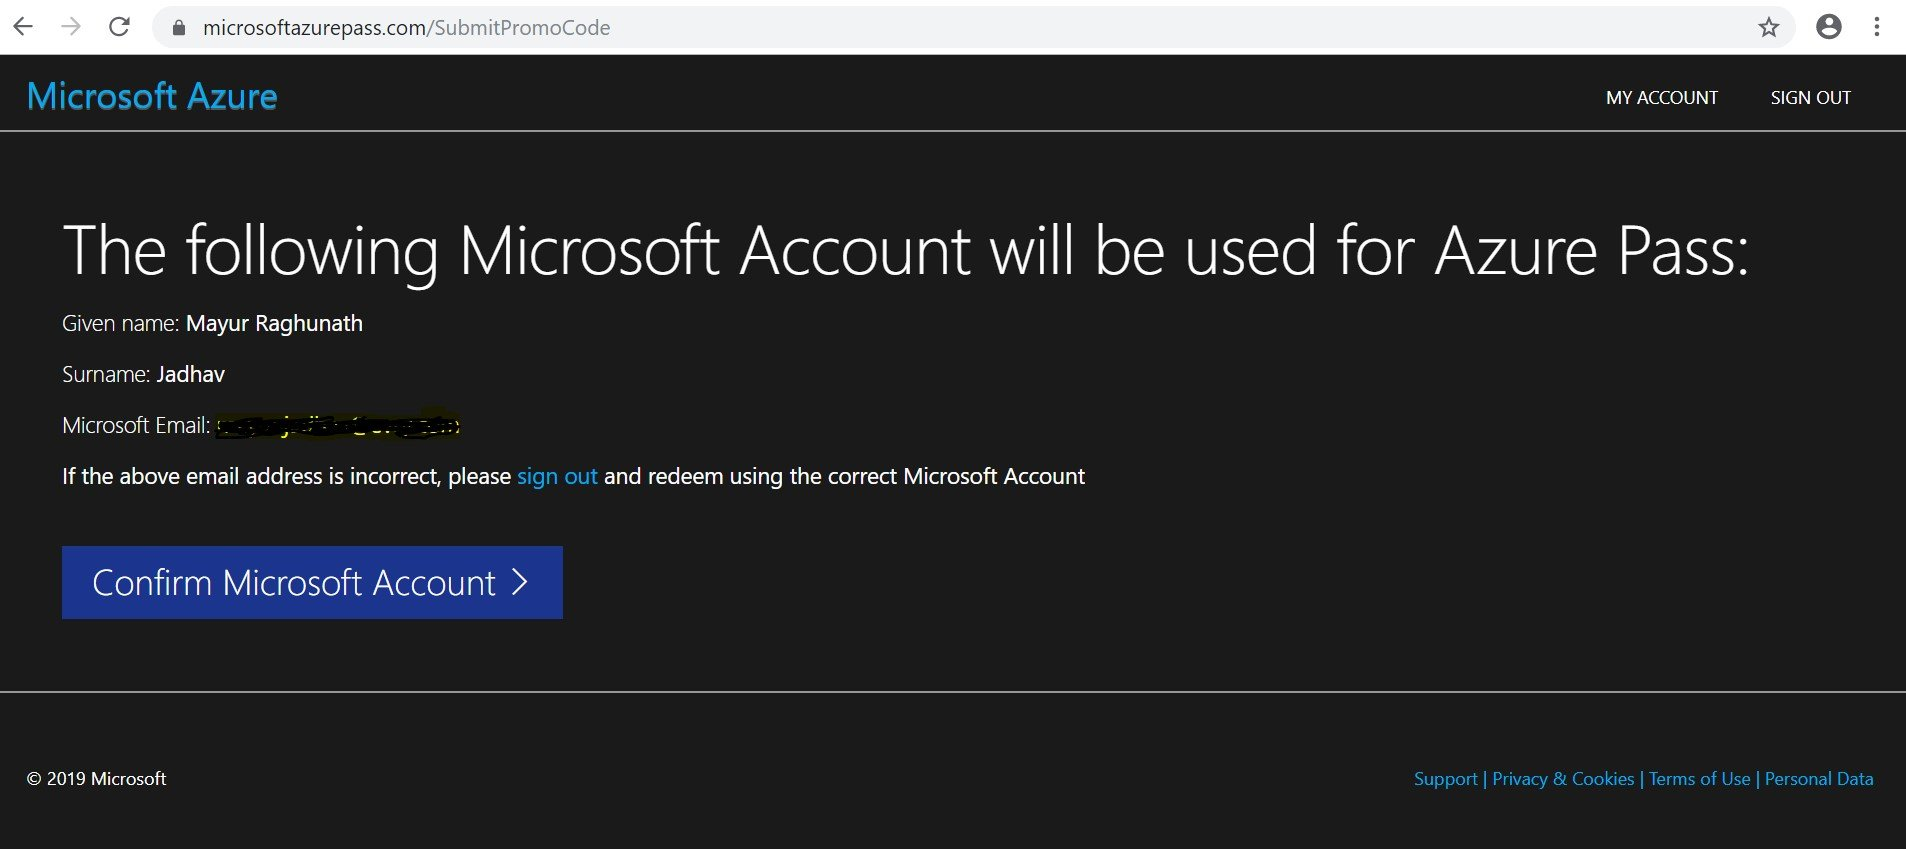 Microsoft Azure Account